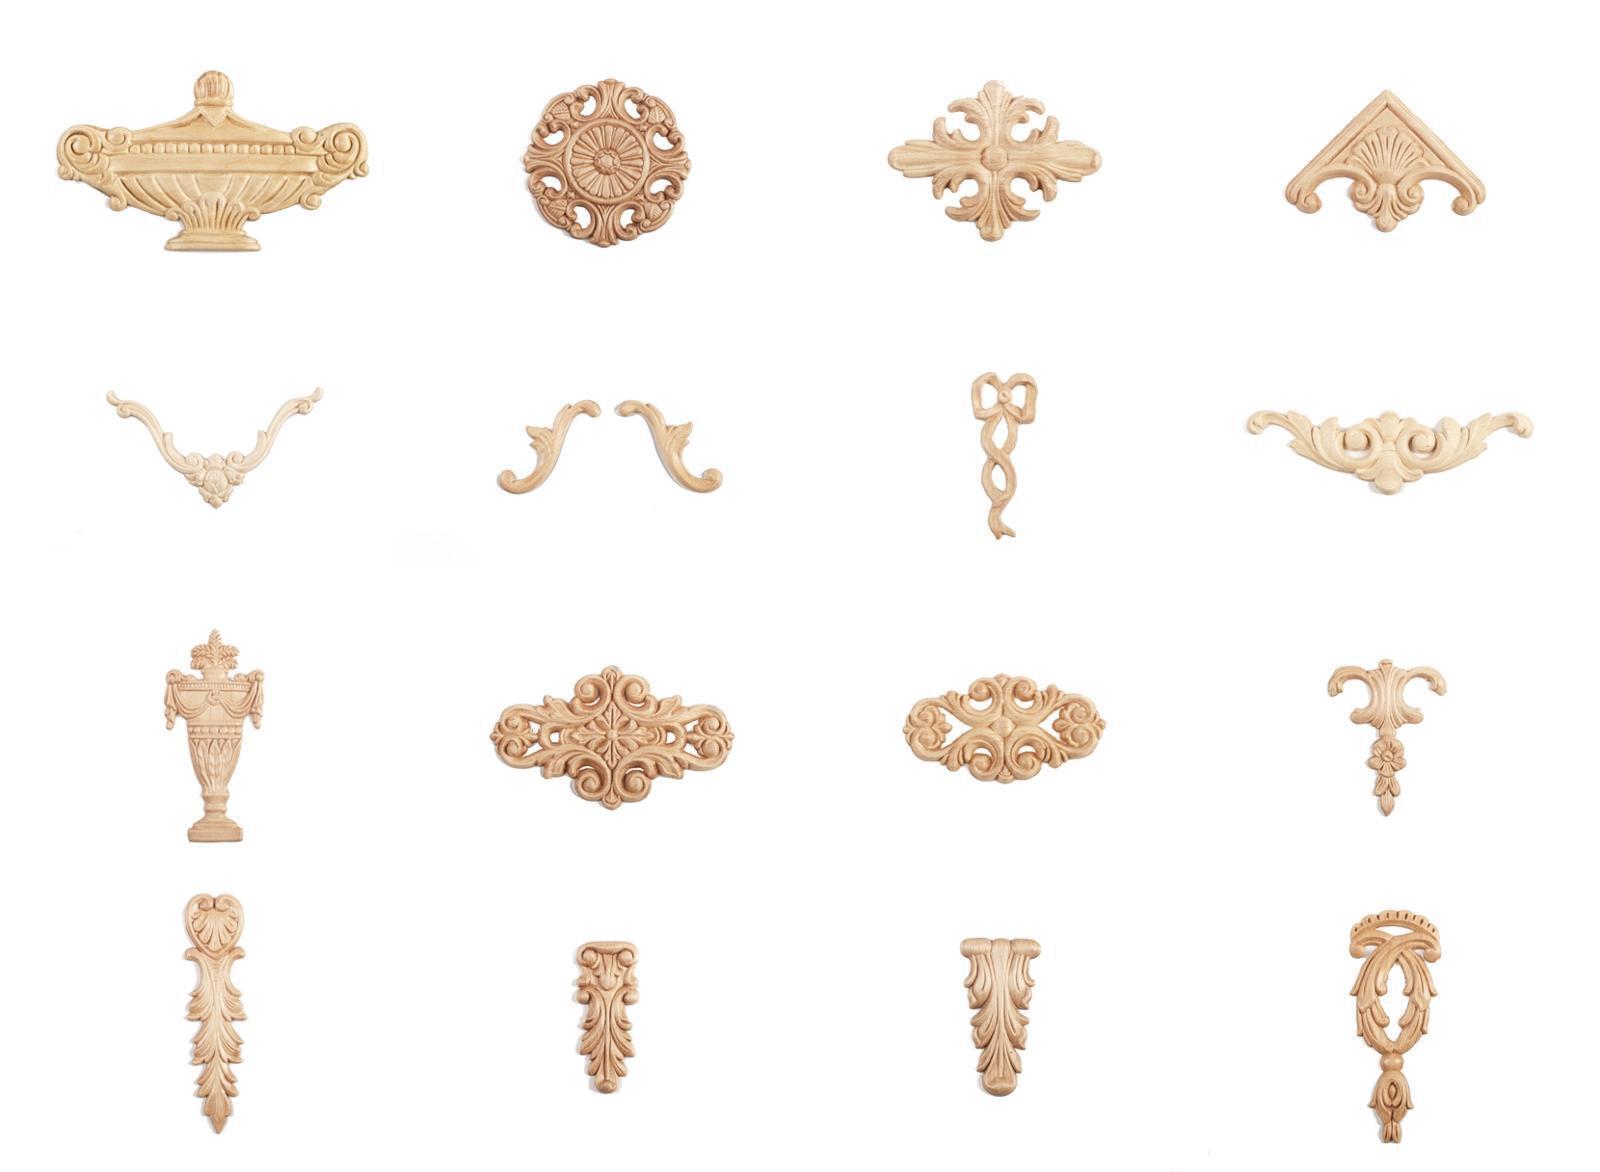 Holz zierteile verzierungen kapitelle buche ornament antik for Industrie mobel antik